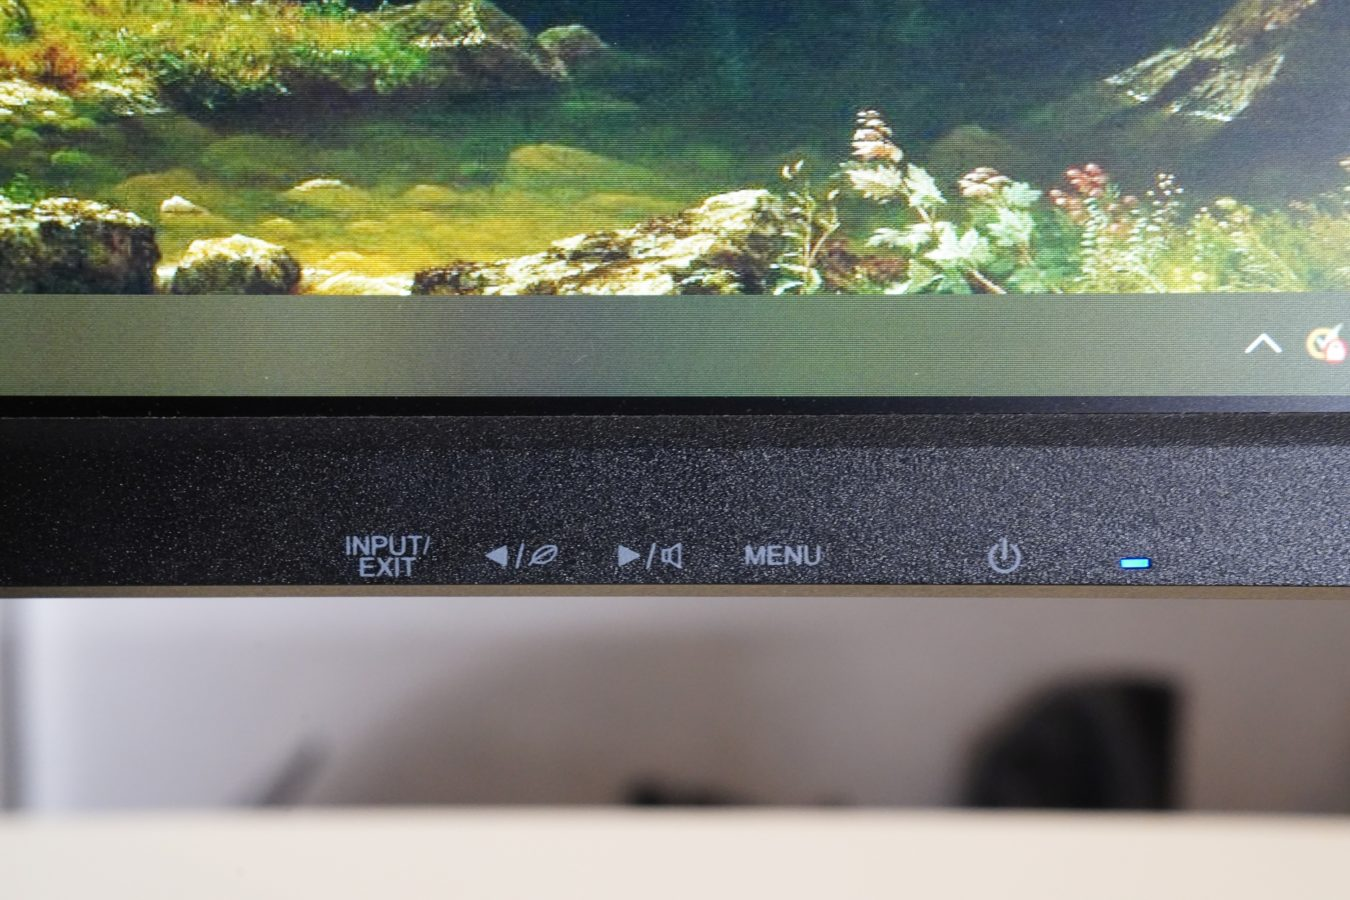 Recenzja iiyama ProLite XUB3493WQSU - drogi, ale fajny monitor! 23 iiyama ProLite XUB3493WQSU